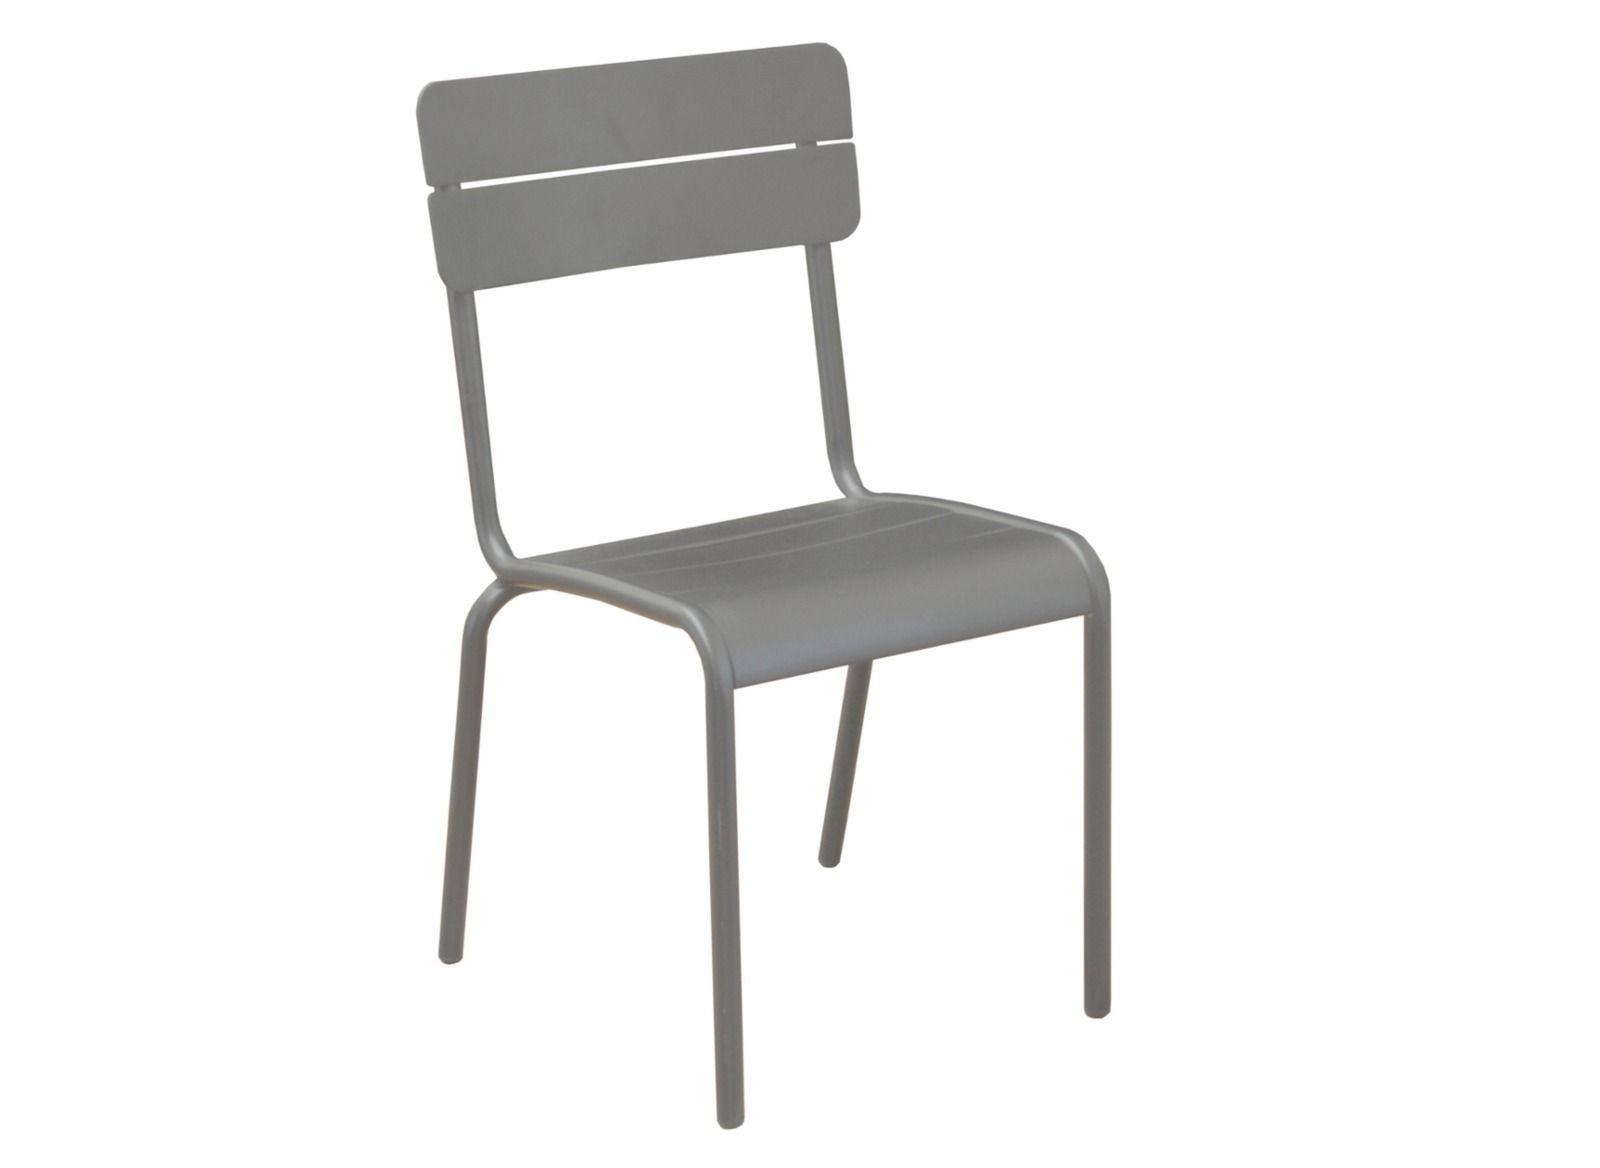 Chaise de salon de jardin aluminium Ecole - Proloisirs | chairs ...